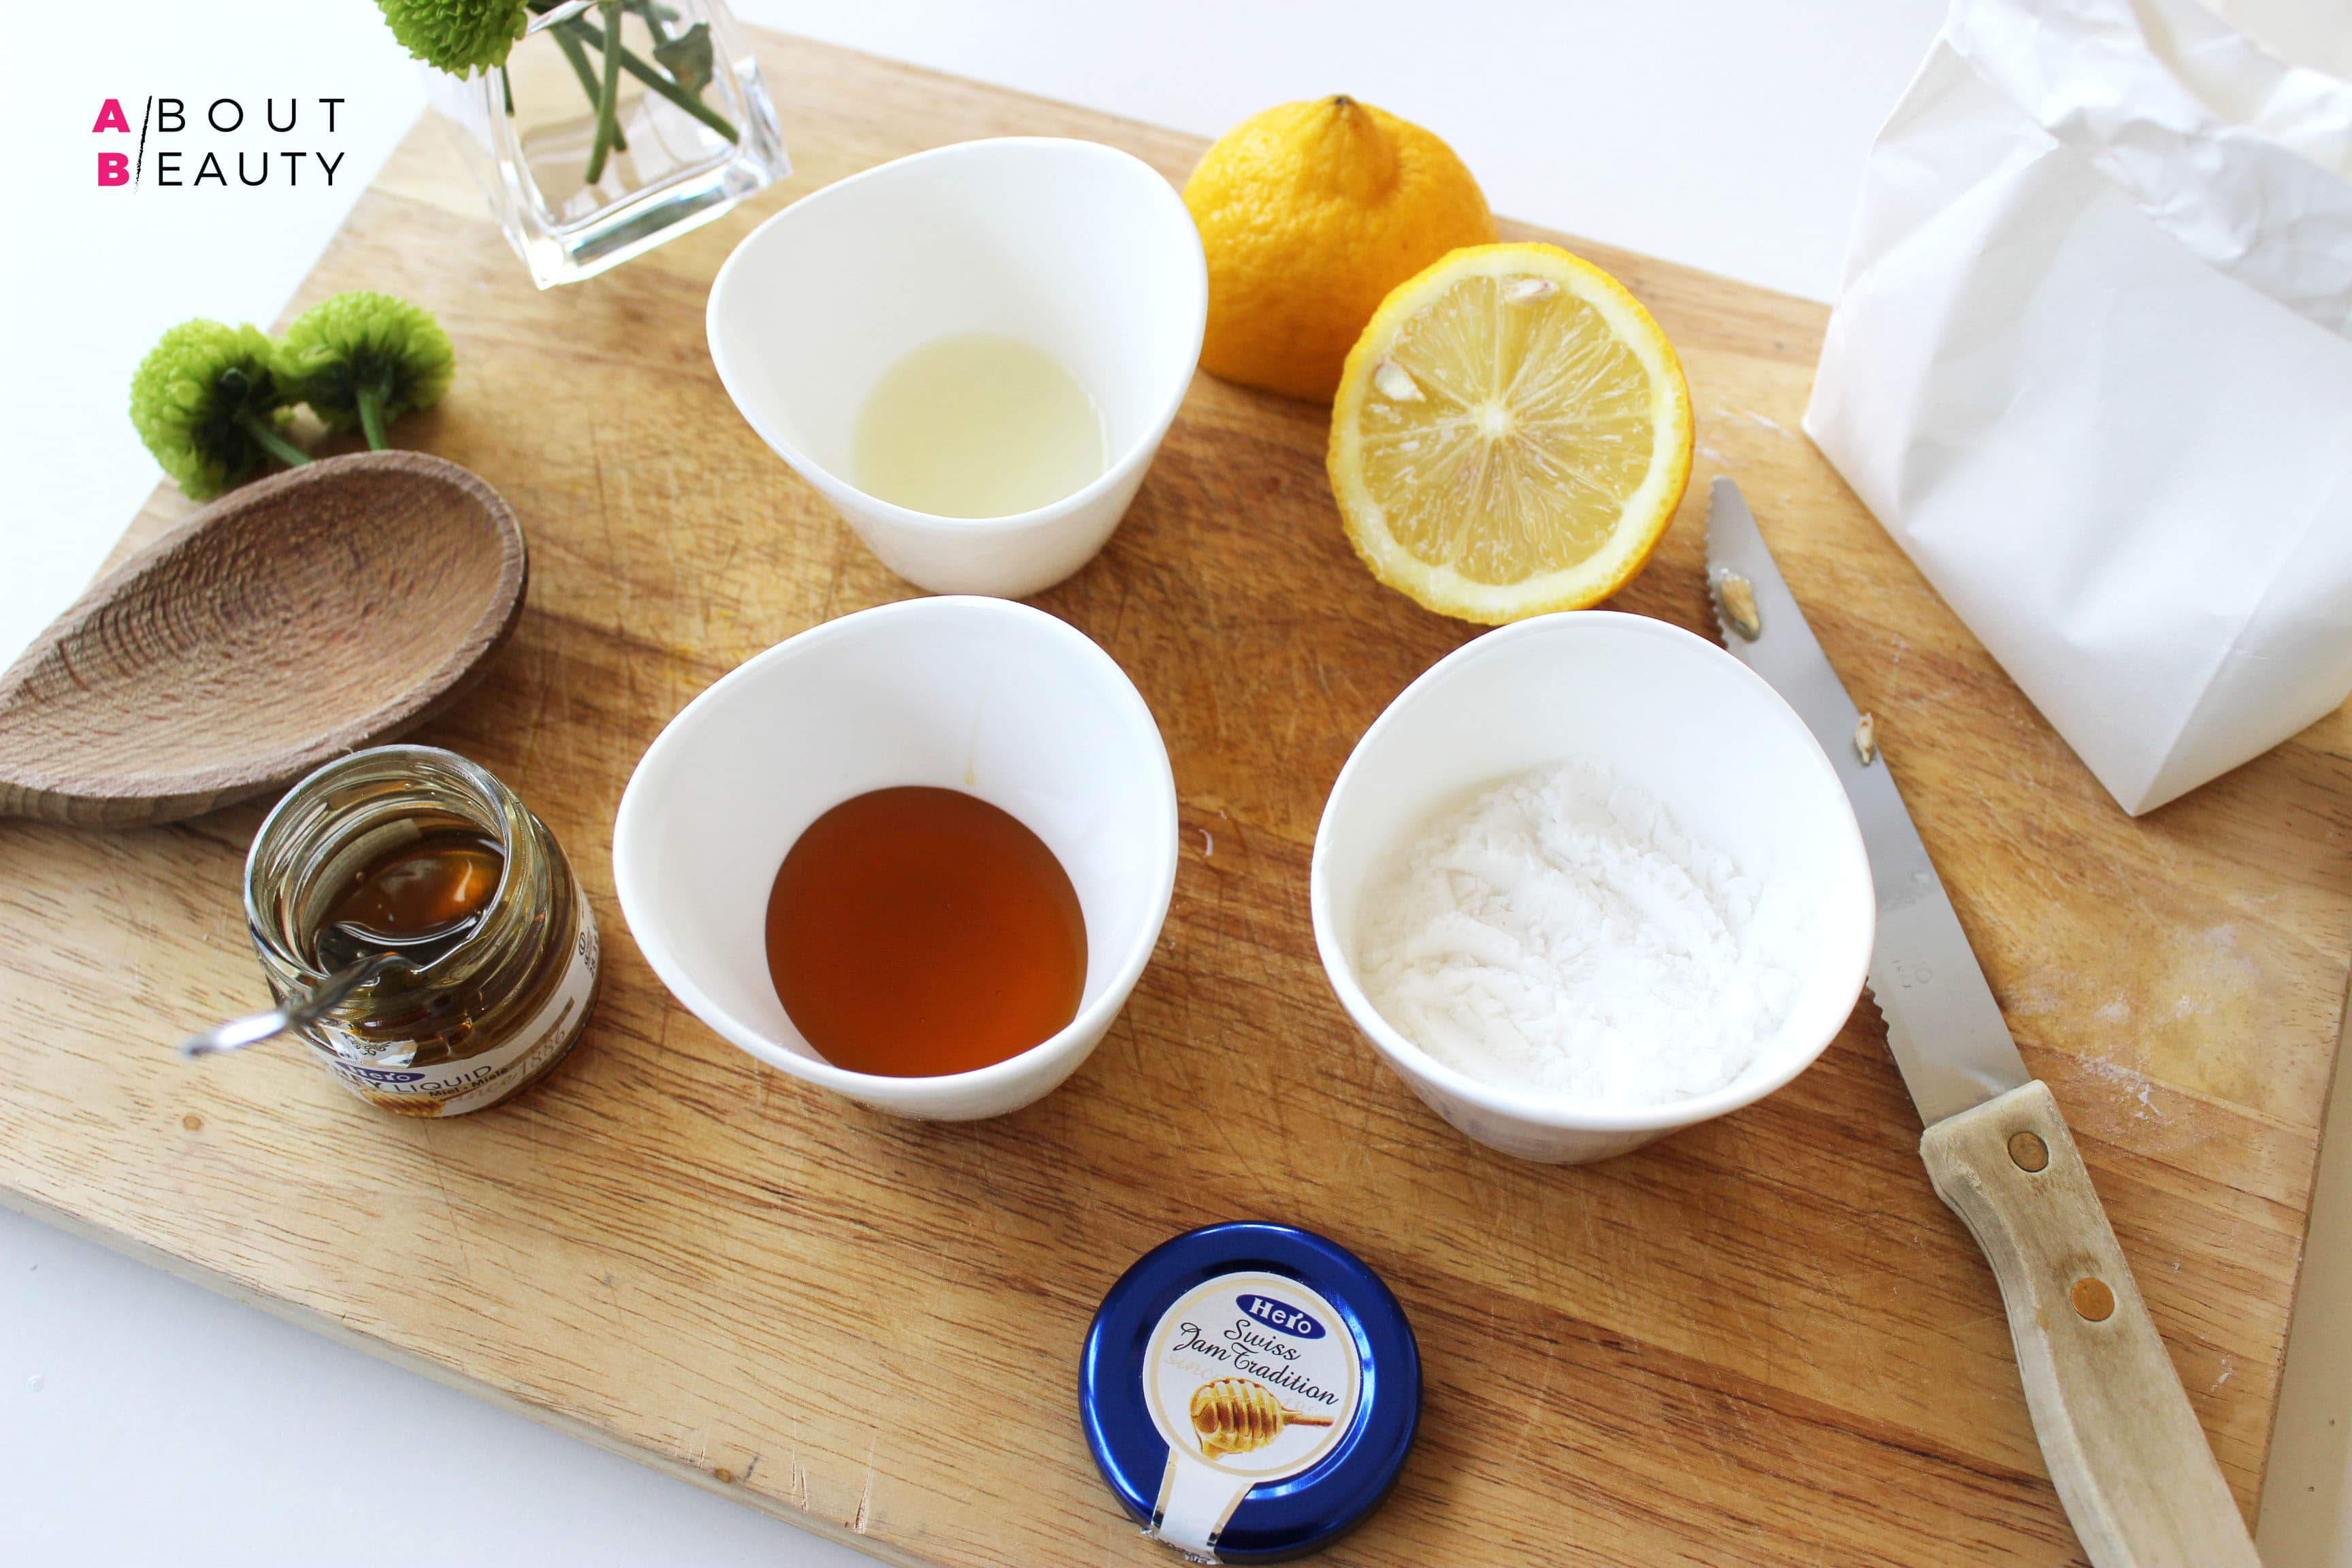 Le ricette di bellezza di About Beauty - Maschera Levigante al miele - Ingredienti